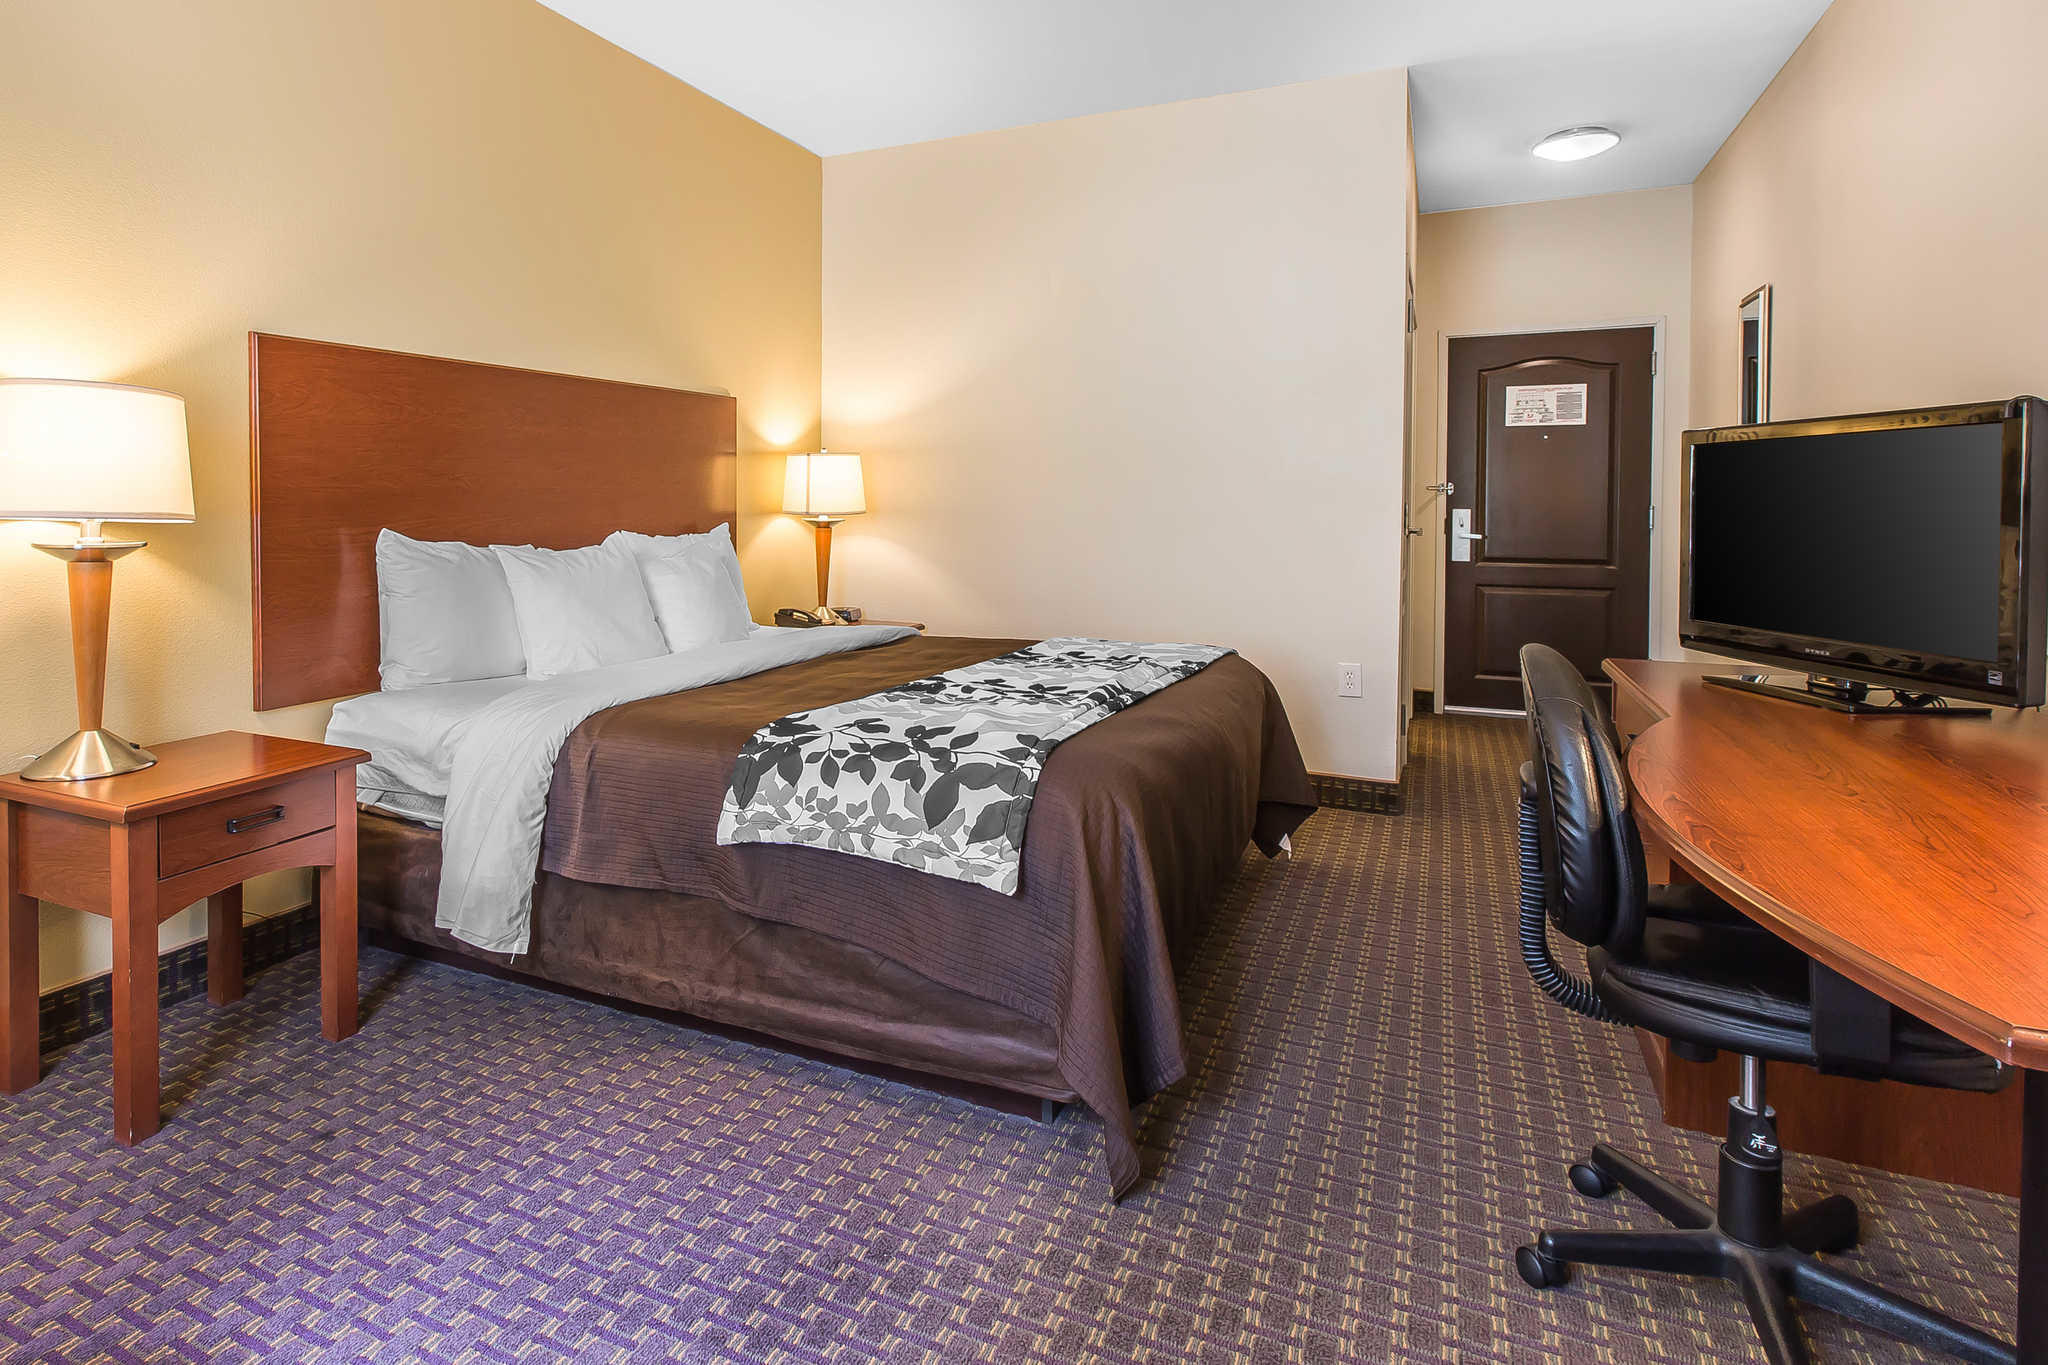 Sleep Inn & Suites At Kennesaw State University image 0